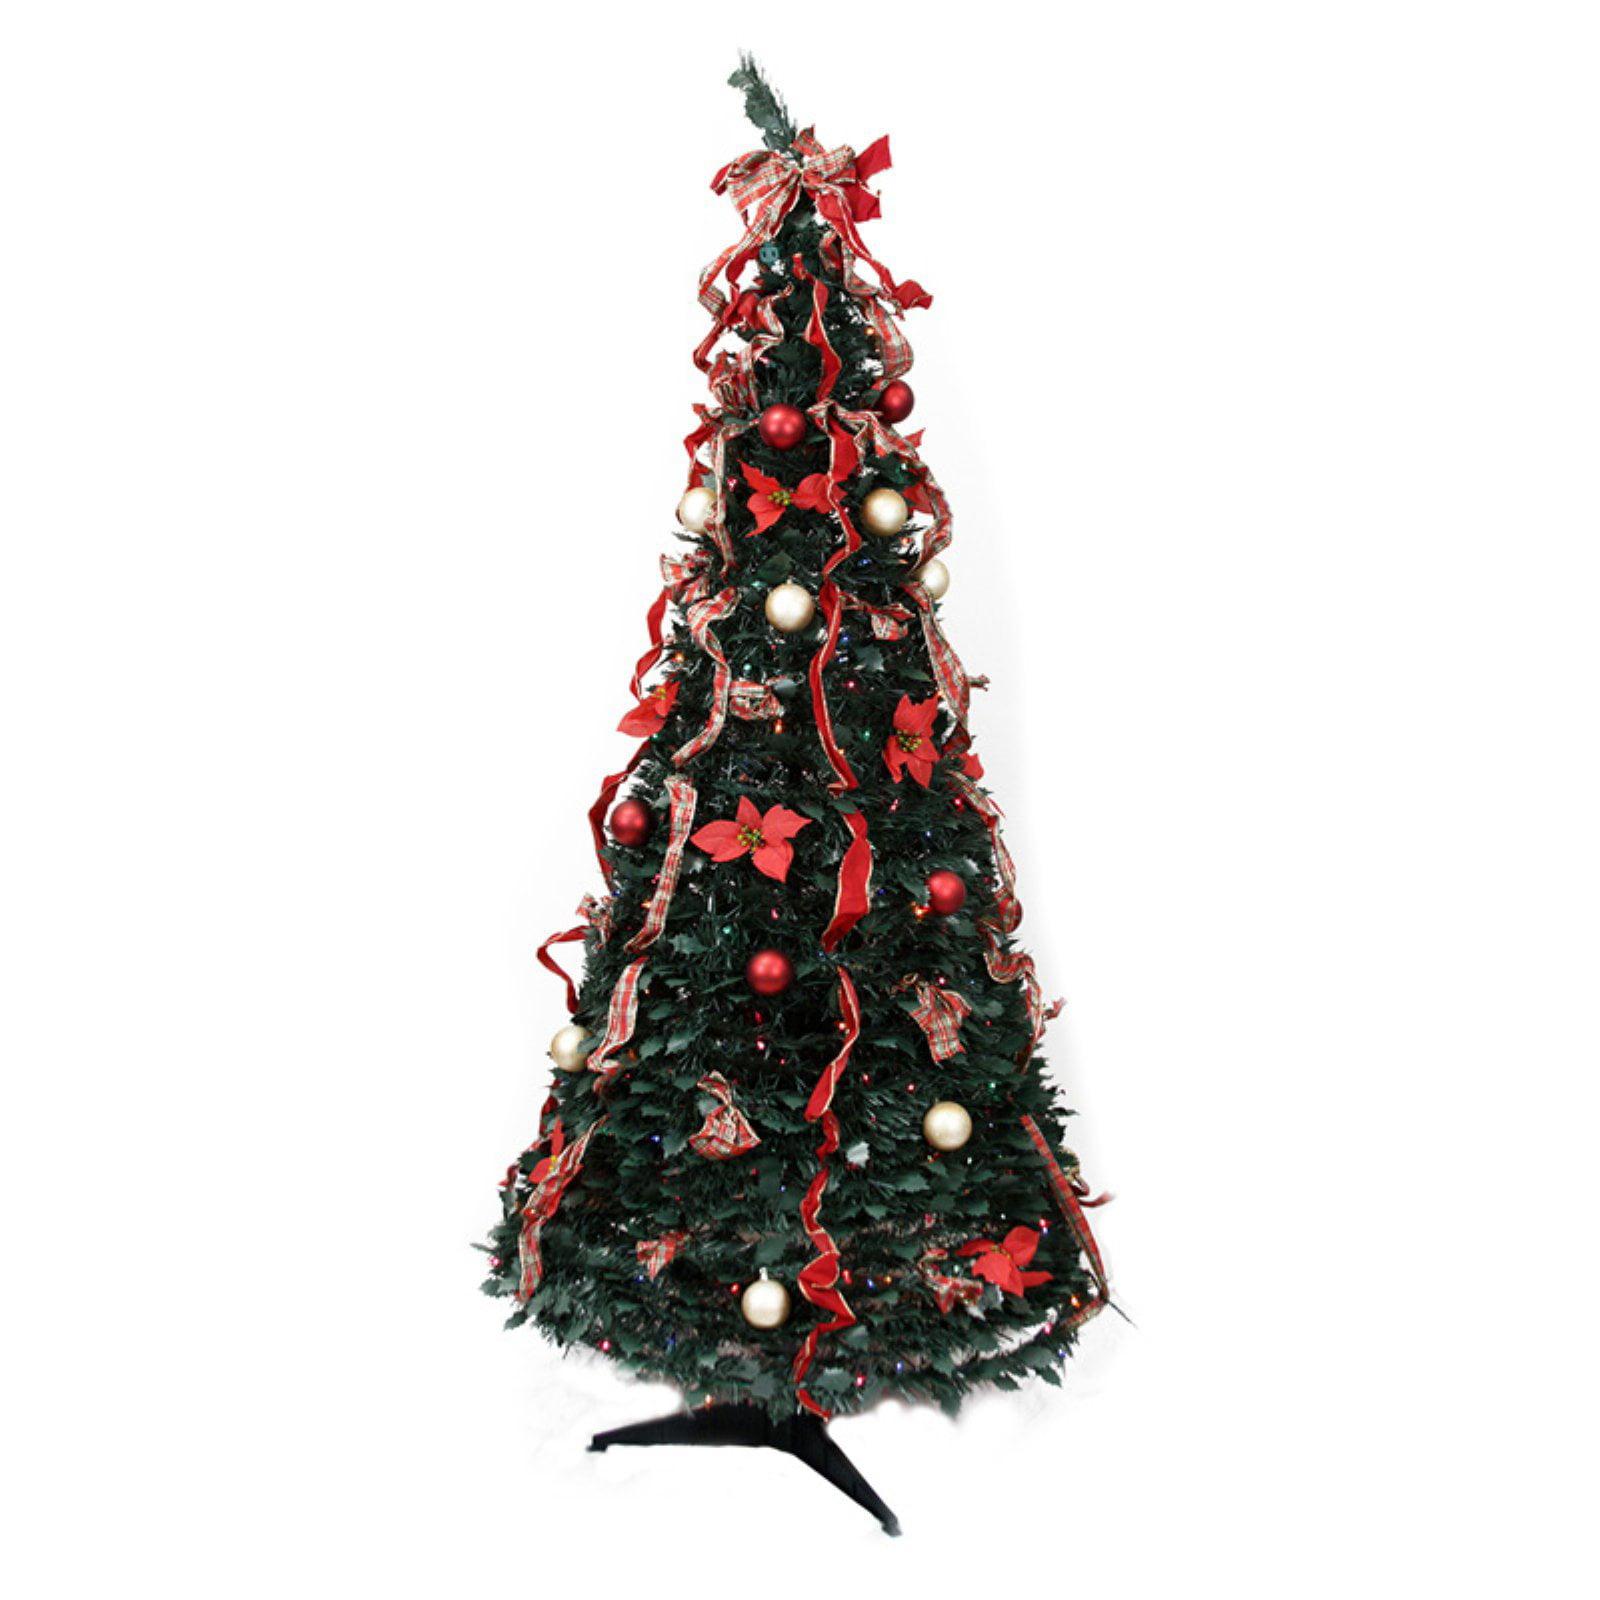 Northlight 6 Ft Pre Lit Decorated Pop Up Christmas Tree Walmart Com